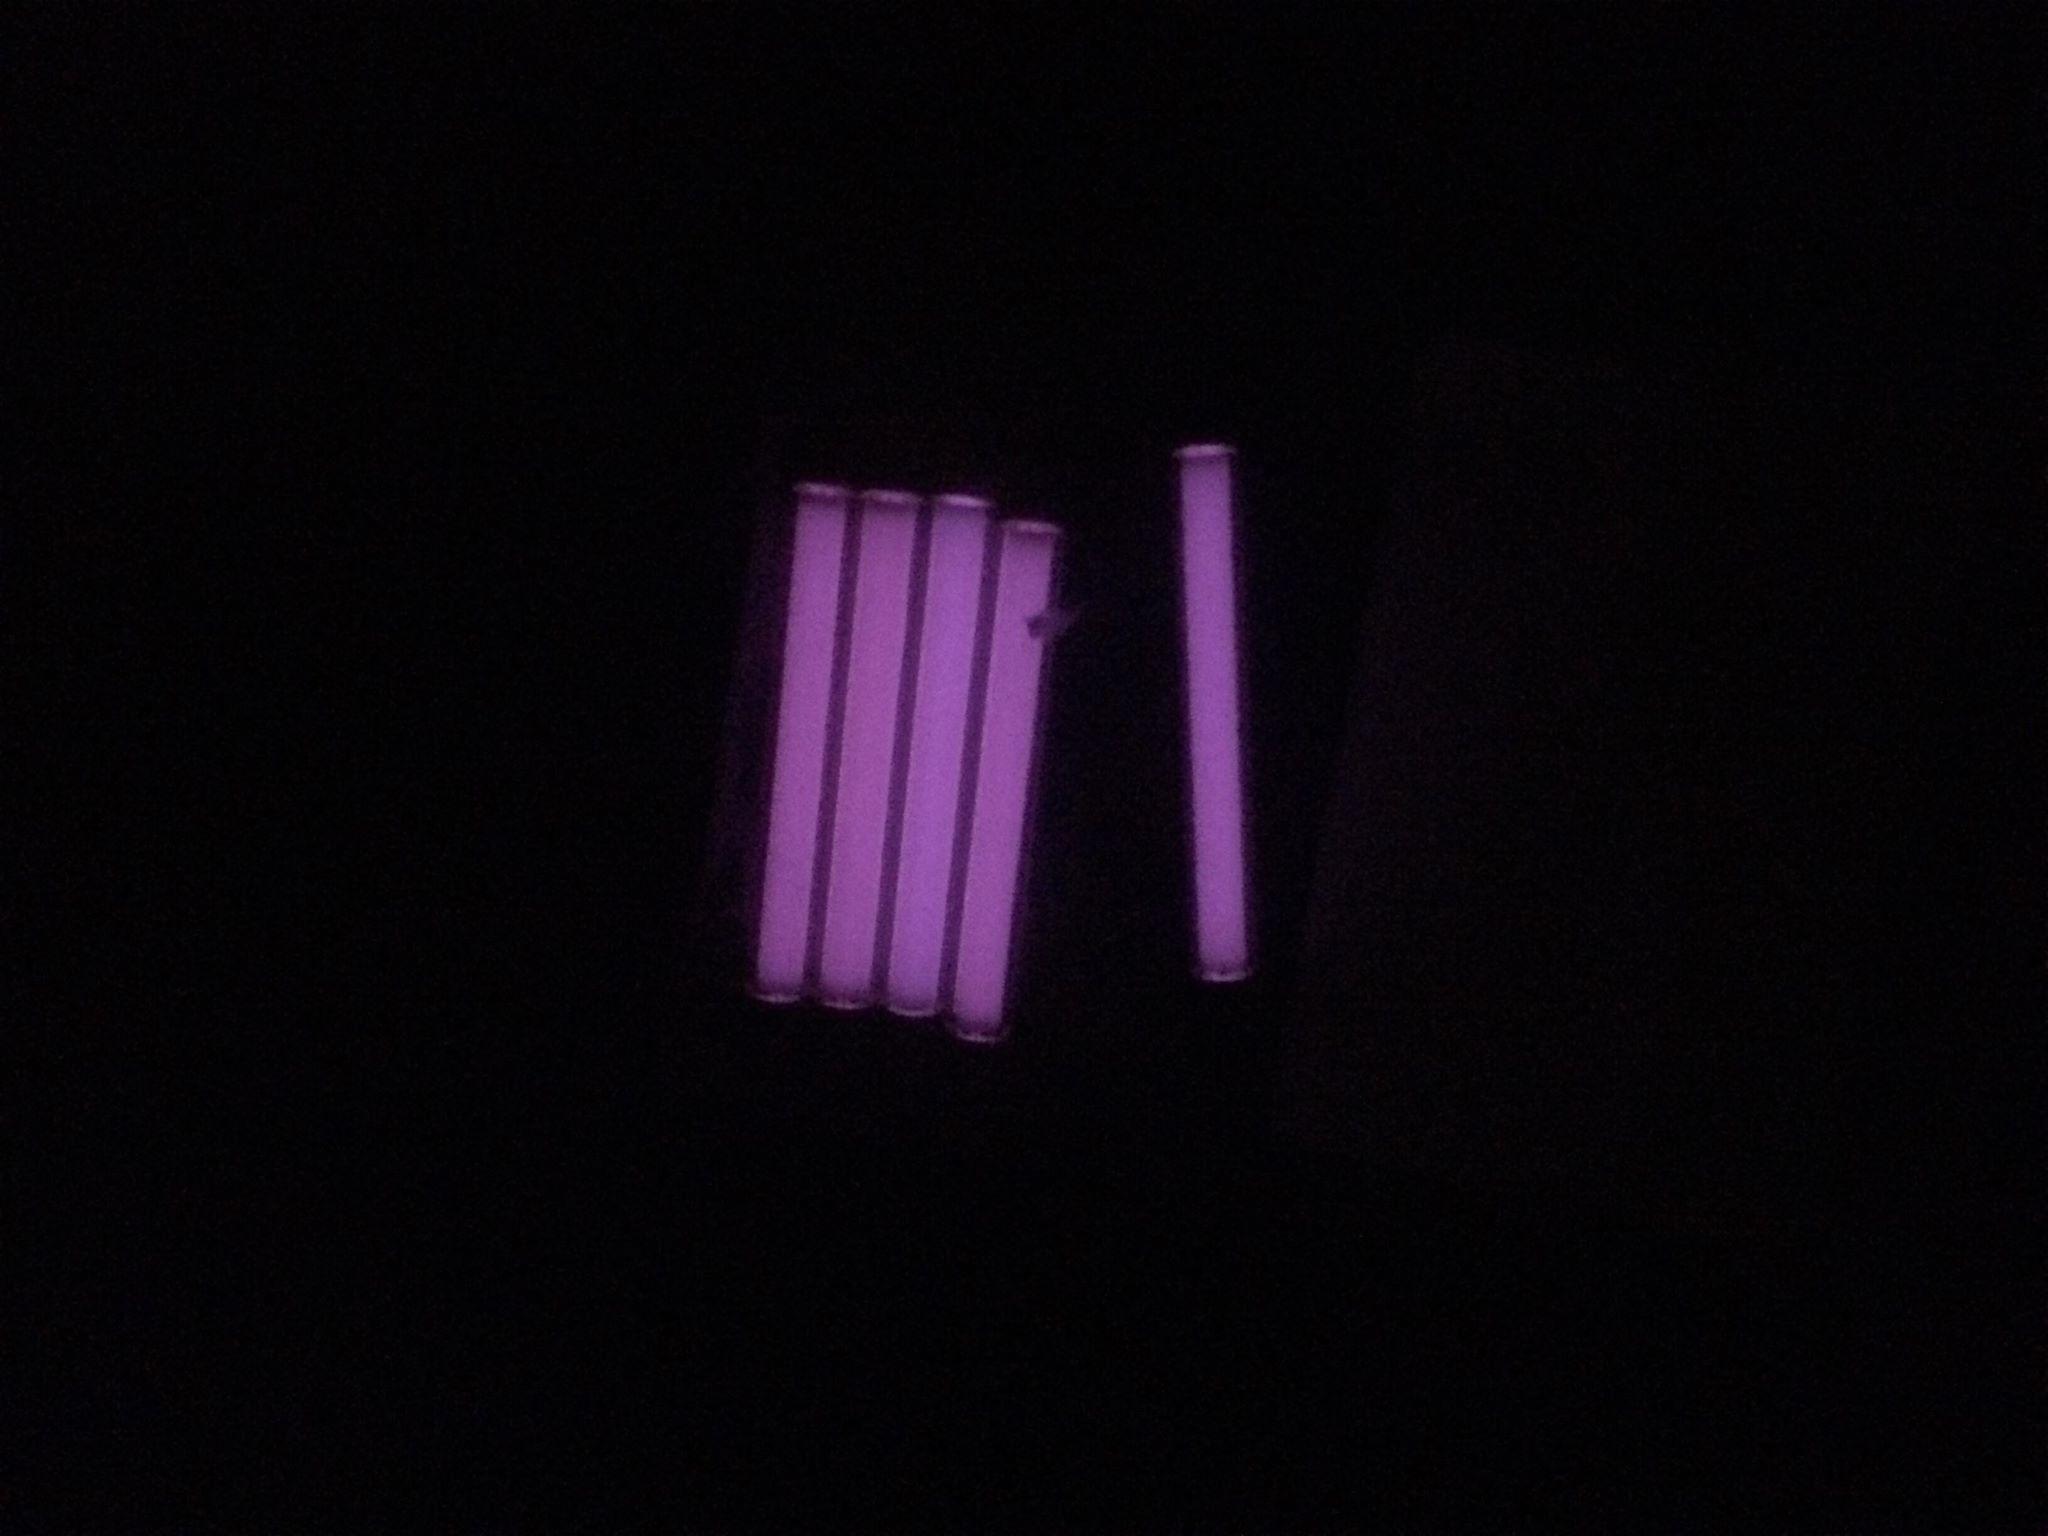 TEC - Thanh Phát Sáng Tritium T3 Vials Pink Purple (Tím hồng - 23mm)